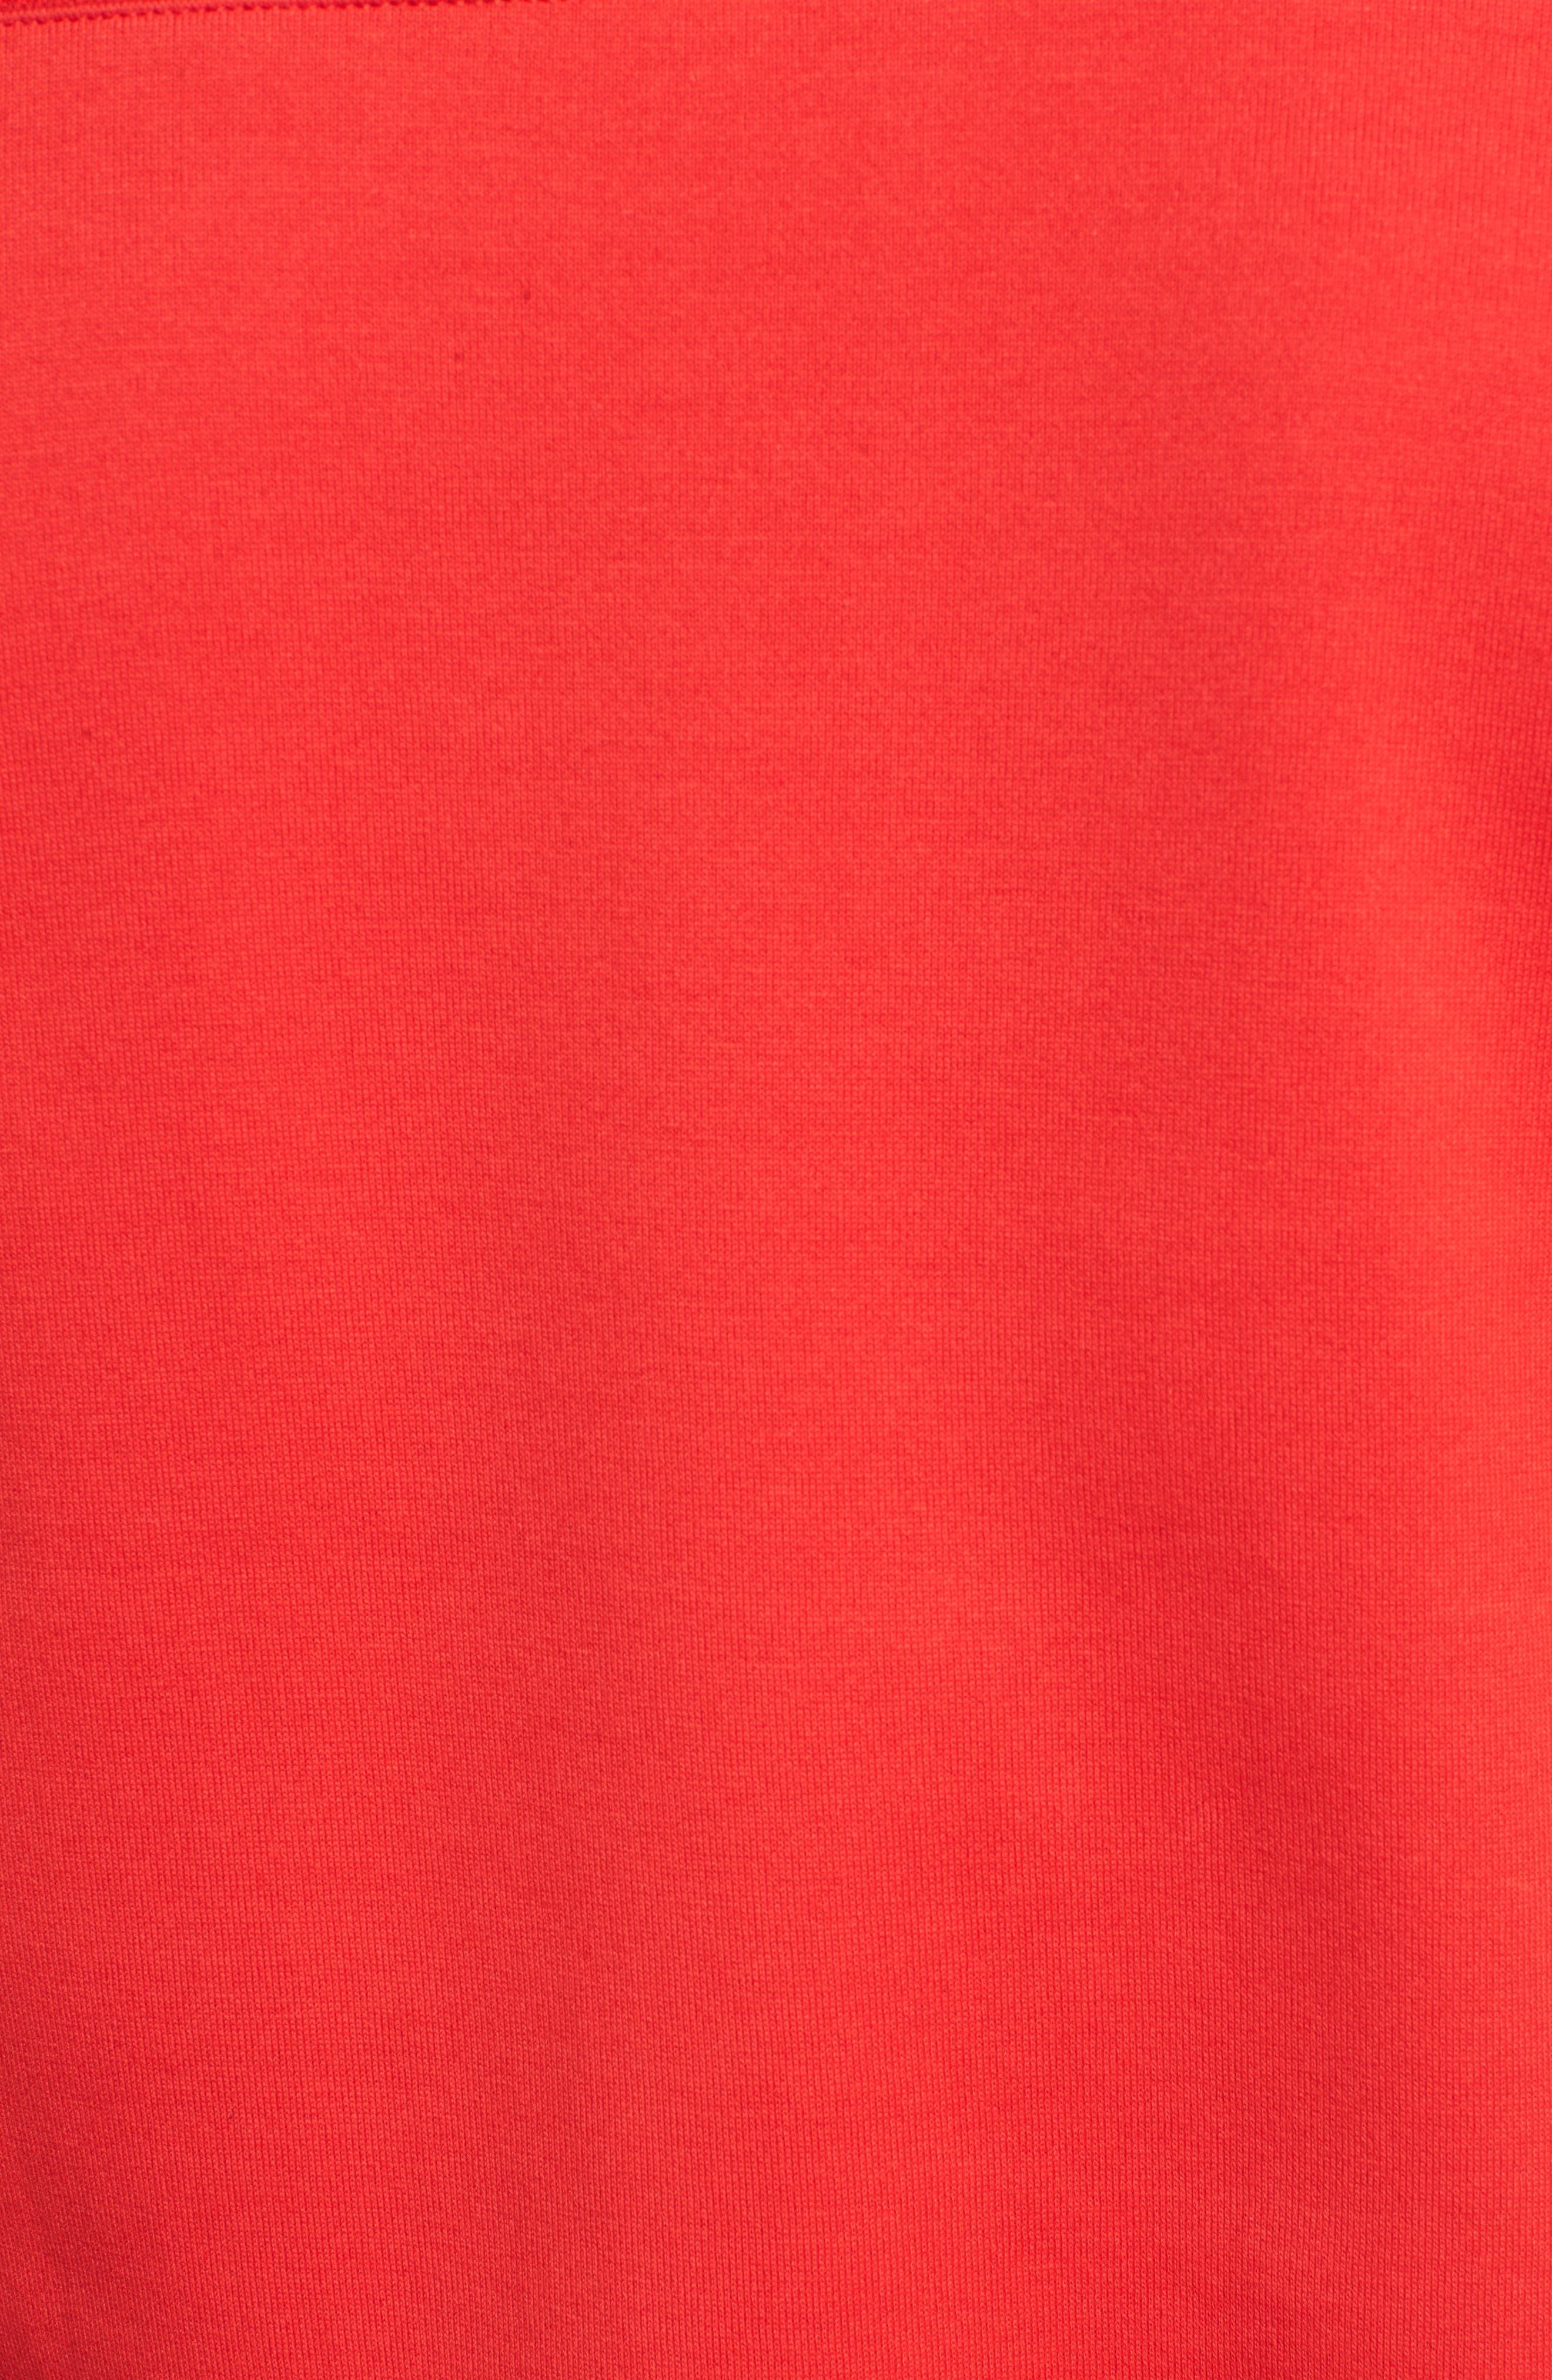 Regular Fit Knit Quarter Zip Pullover,                             Alternate thumbnail 20, color,